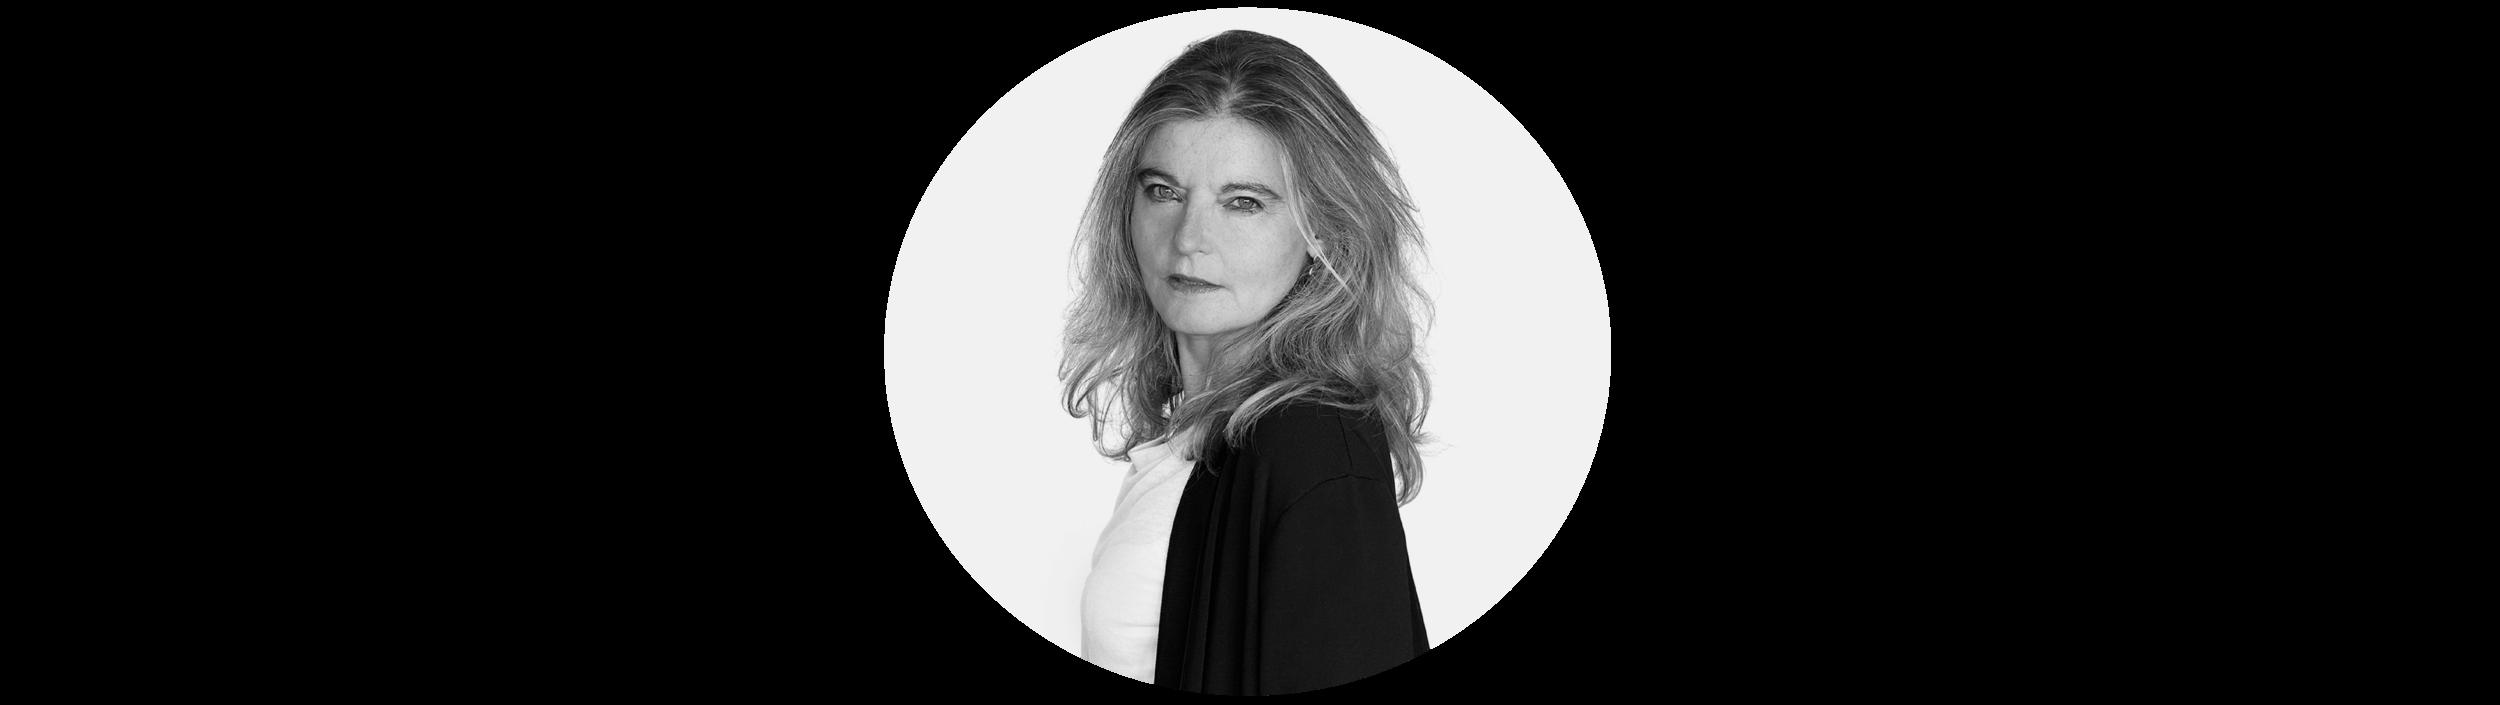 Sandrine Treiner.png